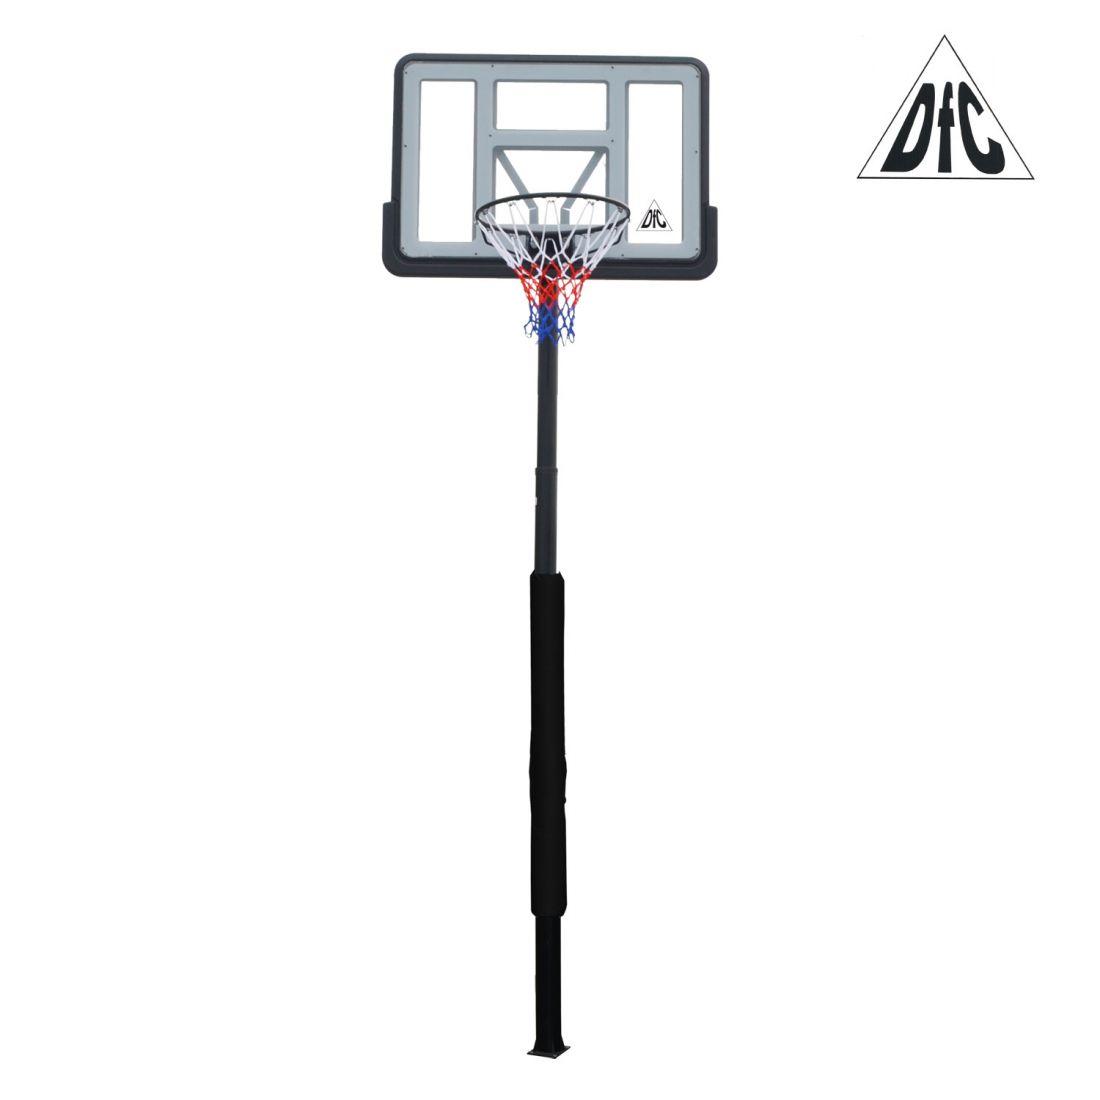 Стационарная баскетбольная стойка - DFC ING44P3